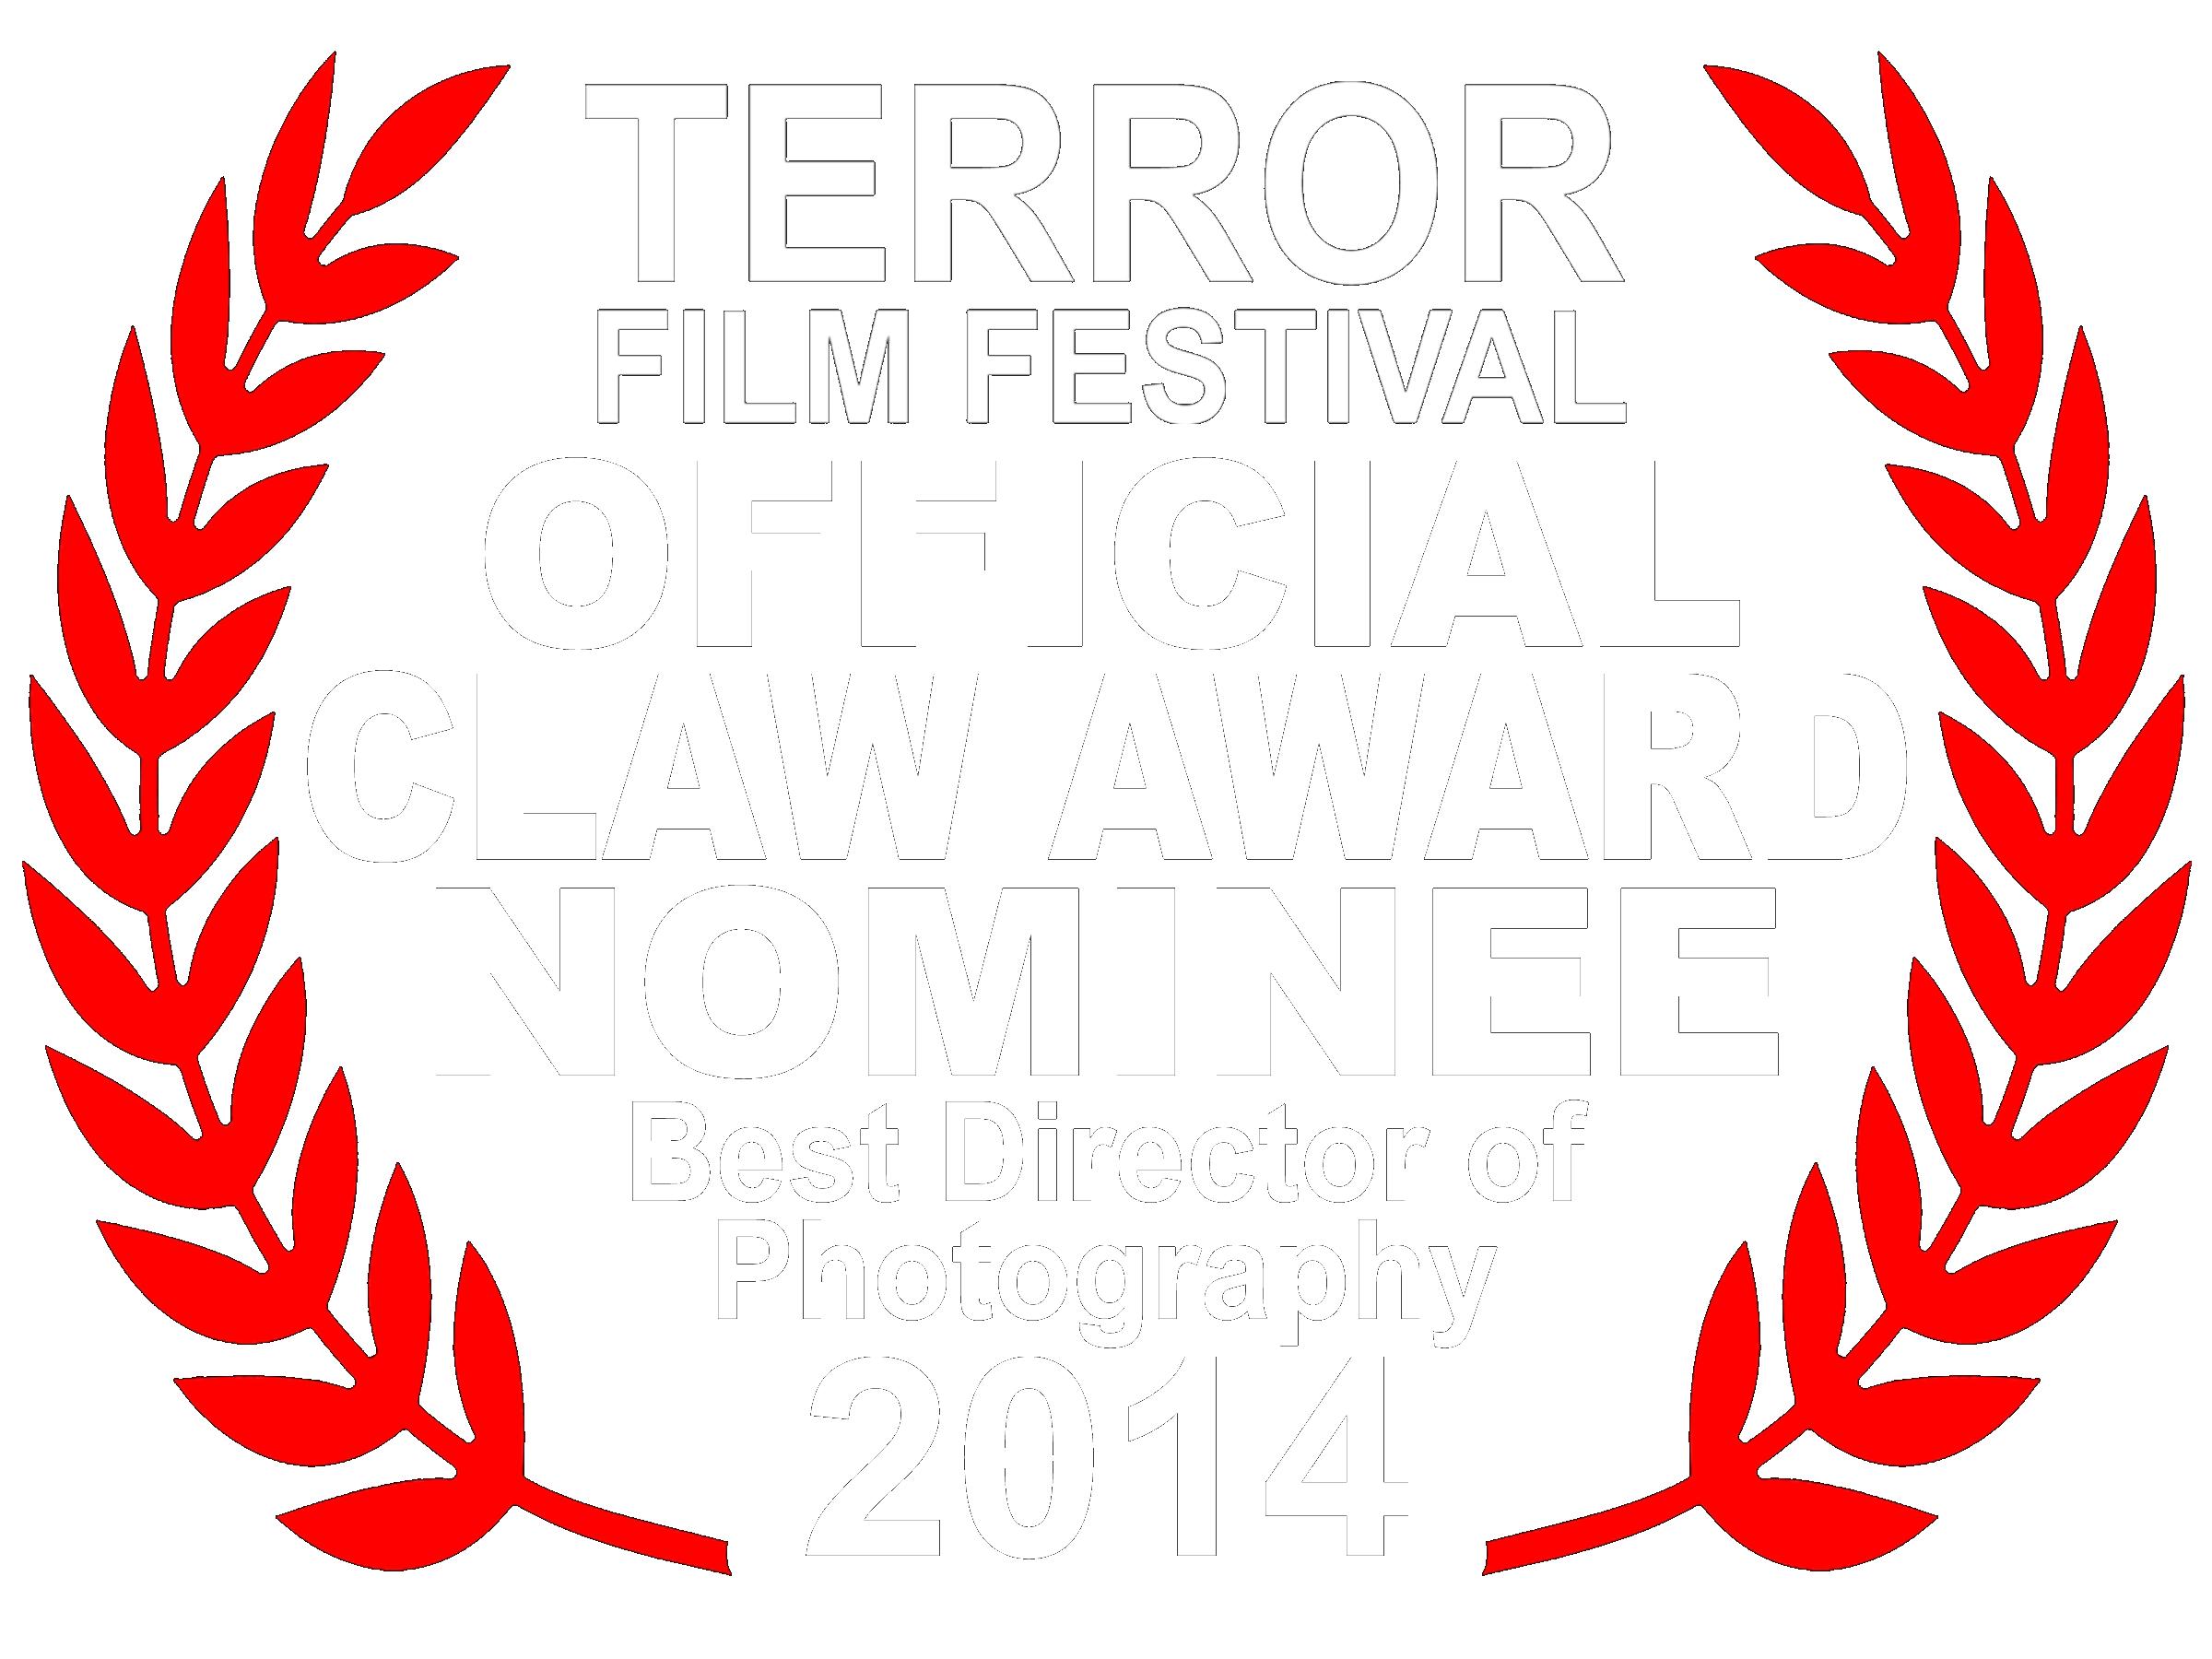 TerrorFilmFestival2014 Nominee DP FINAL.png